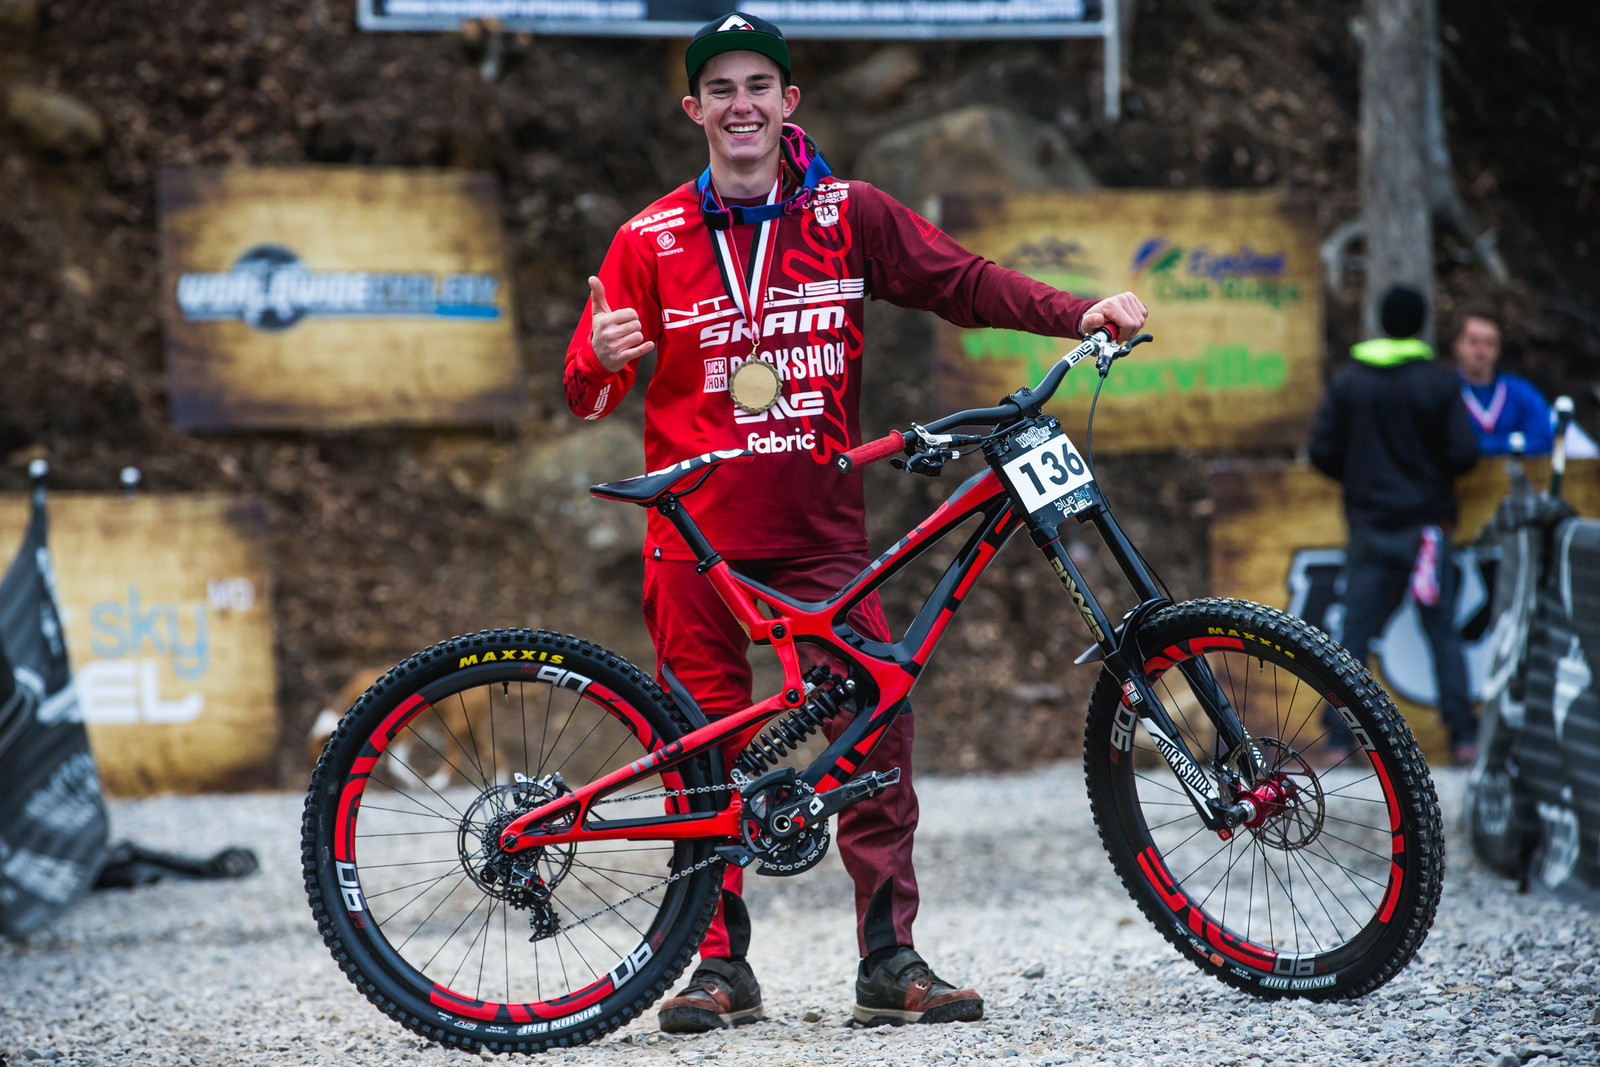 WINNER'S CIRCLE Pro GRT Windrock - Nik Nestoroff with his Intense M16c - WINNER'S CIRCLE - Pro GRT Windrock - Mountain Biking Pictures - Vital MTB